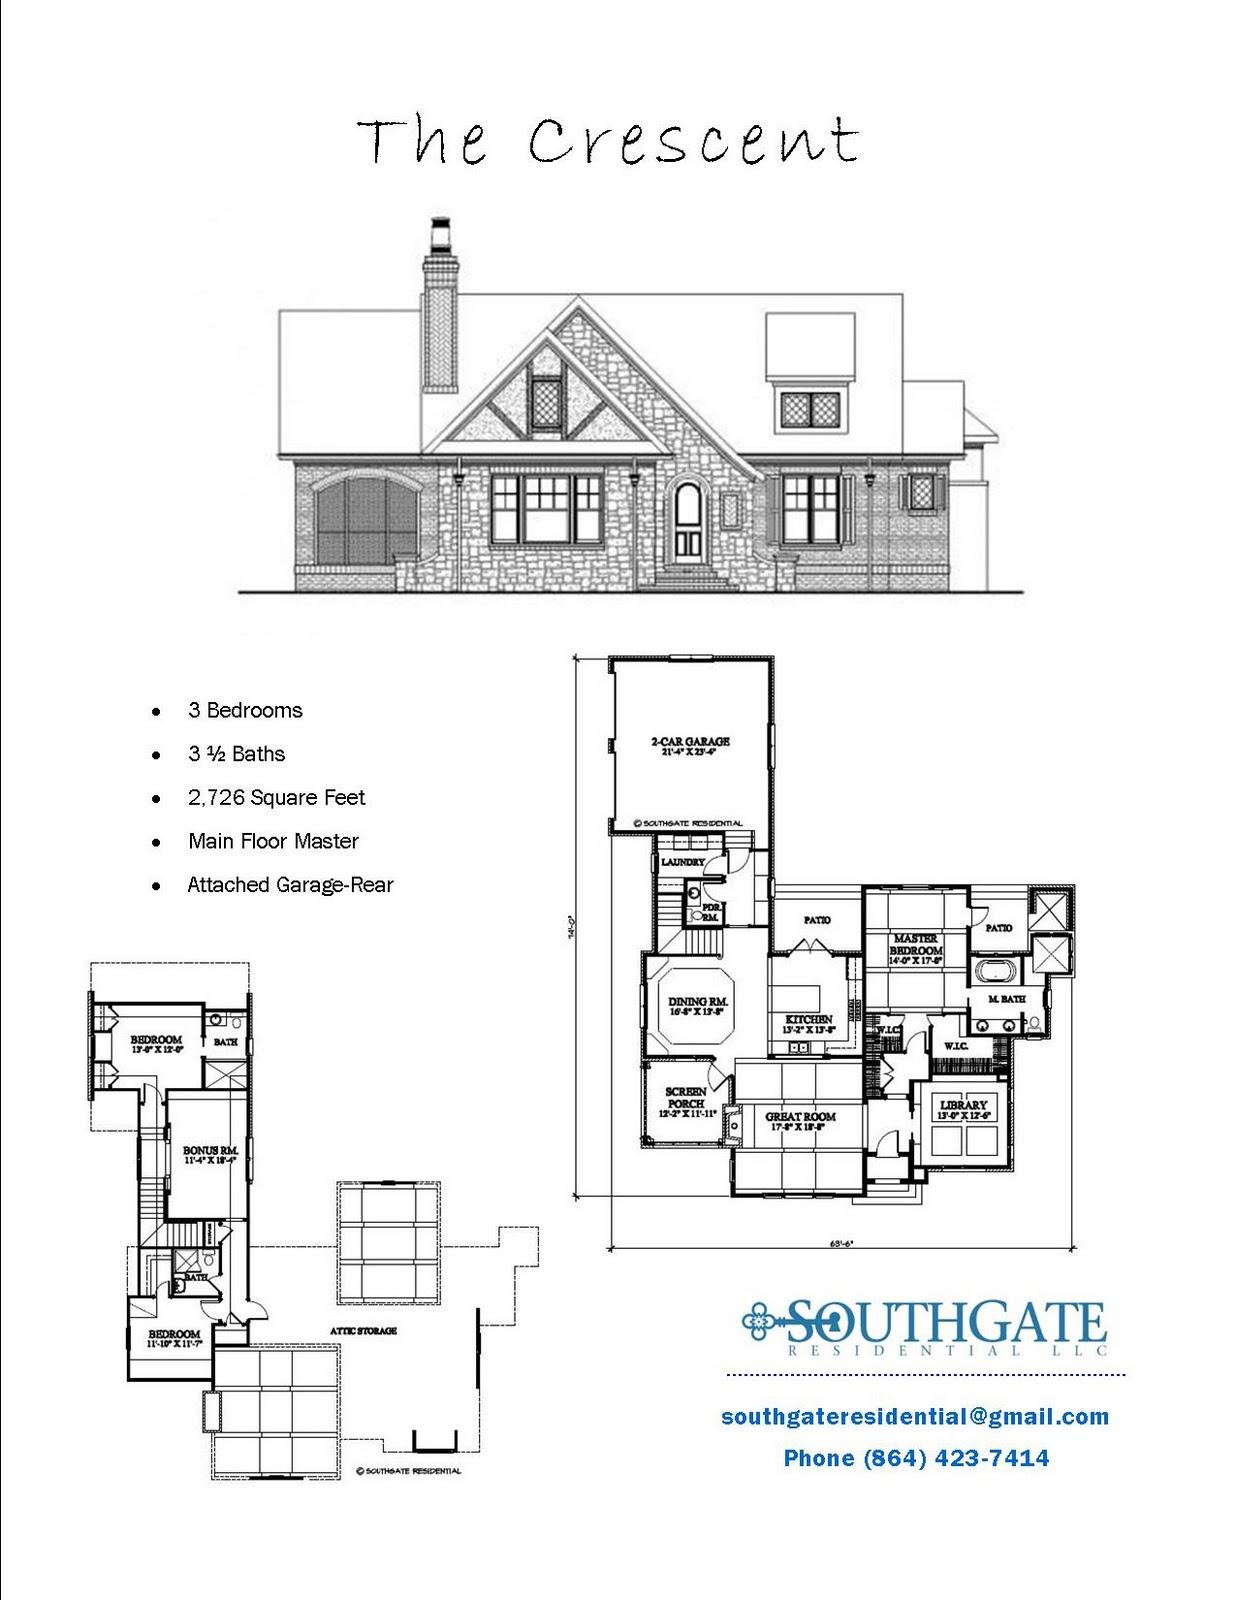 Southgate Residential Pre Designed Plans